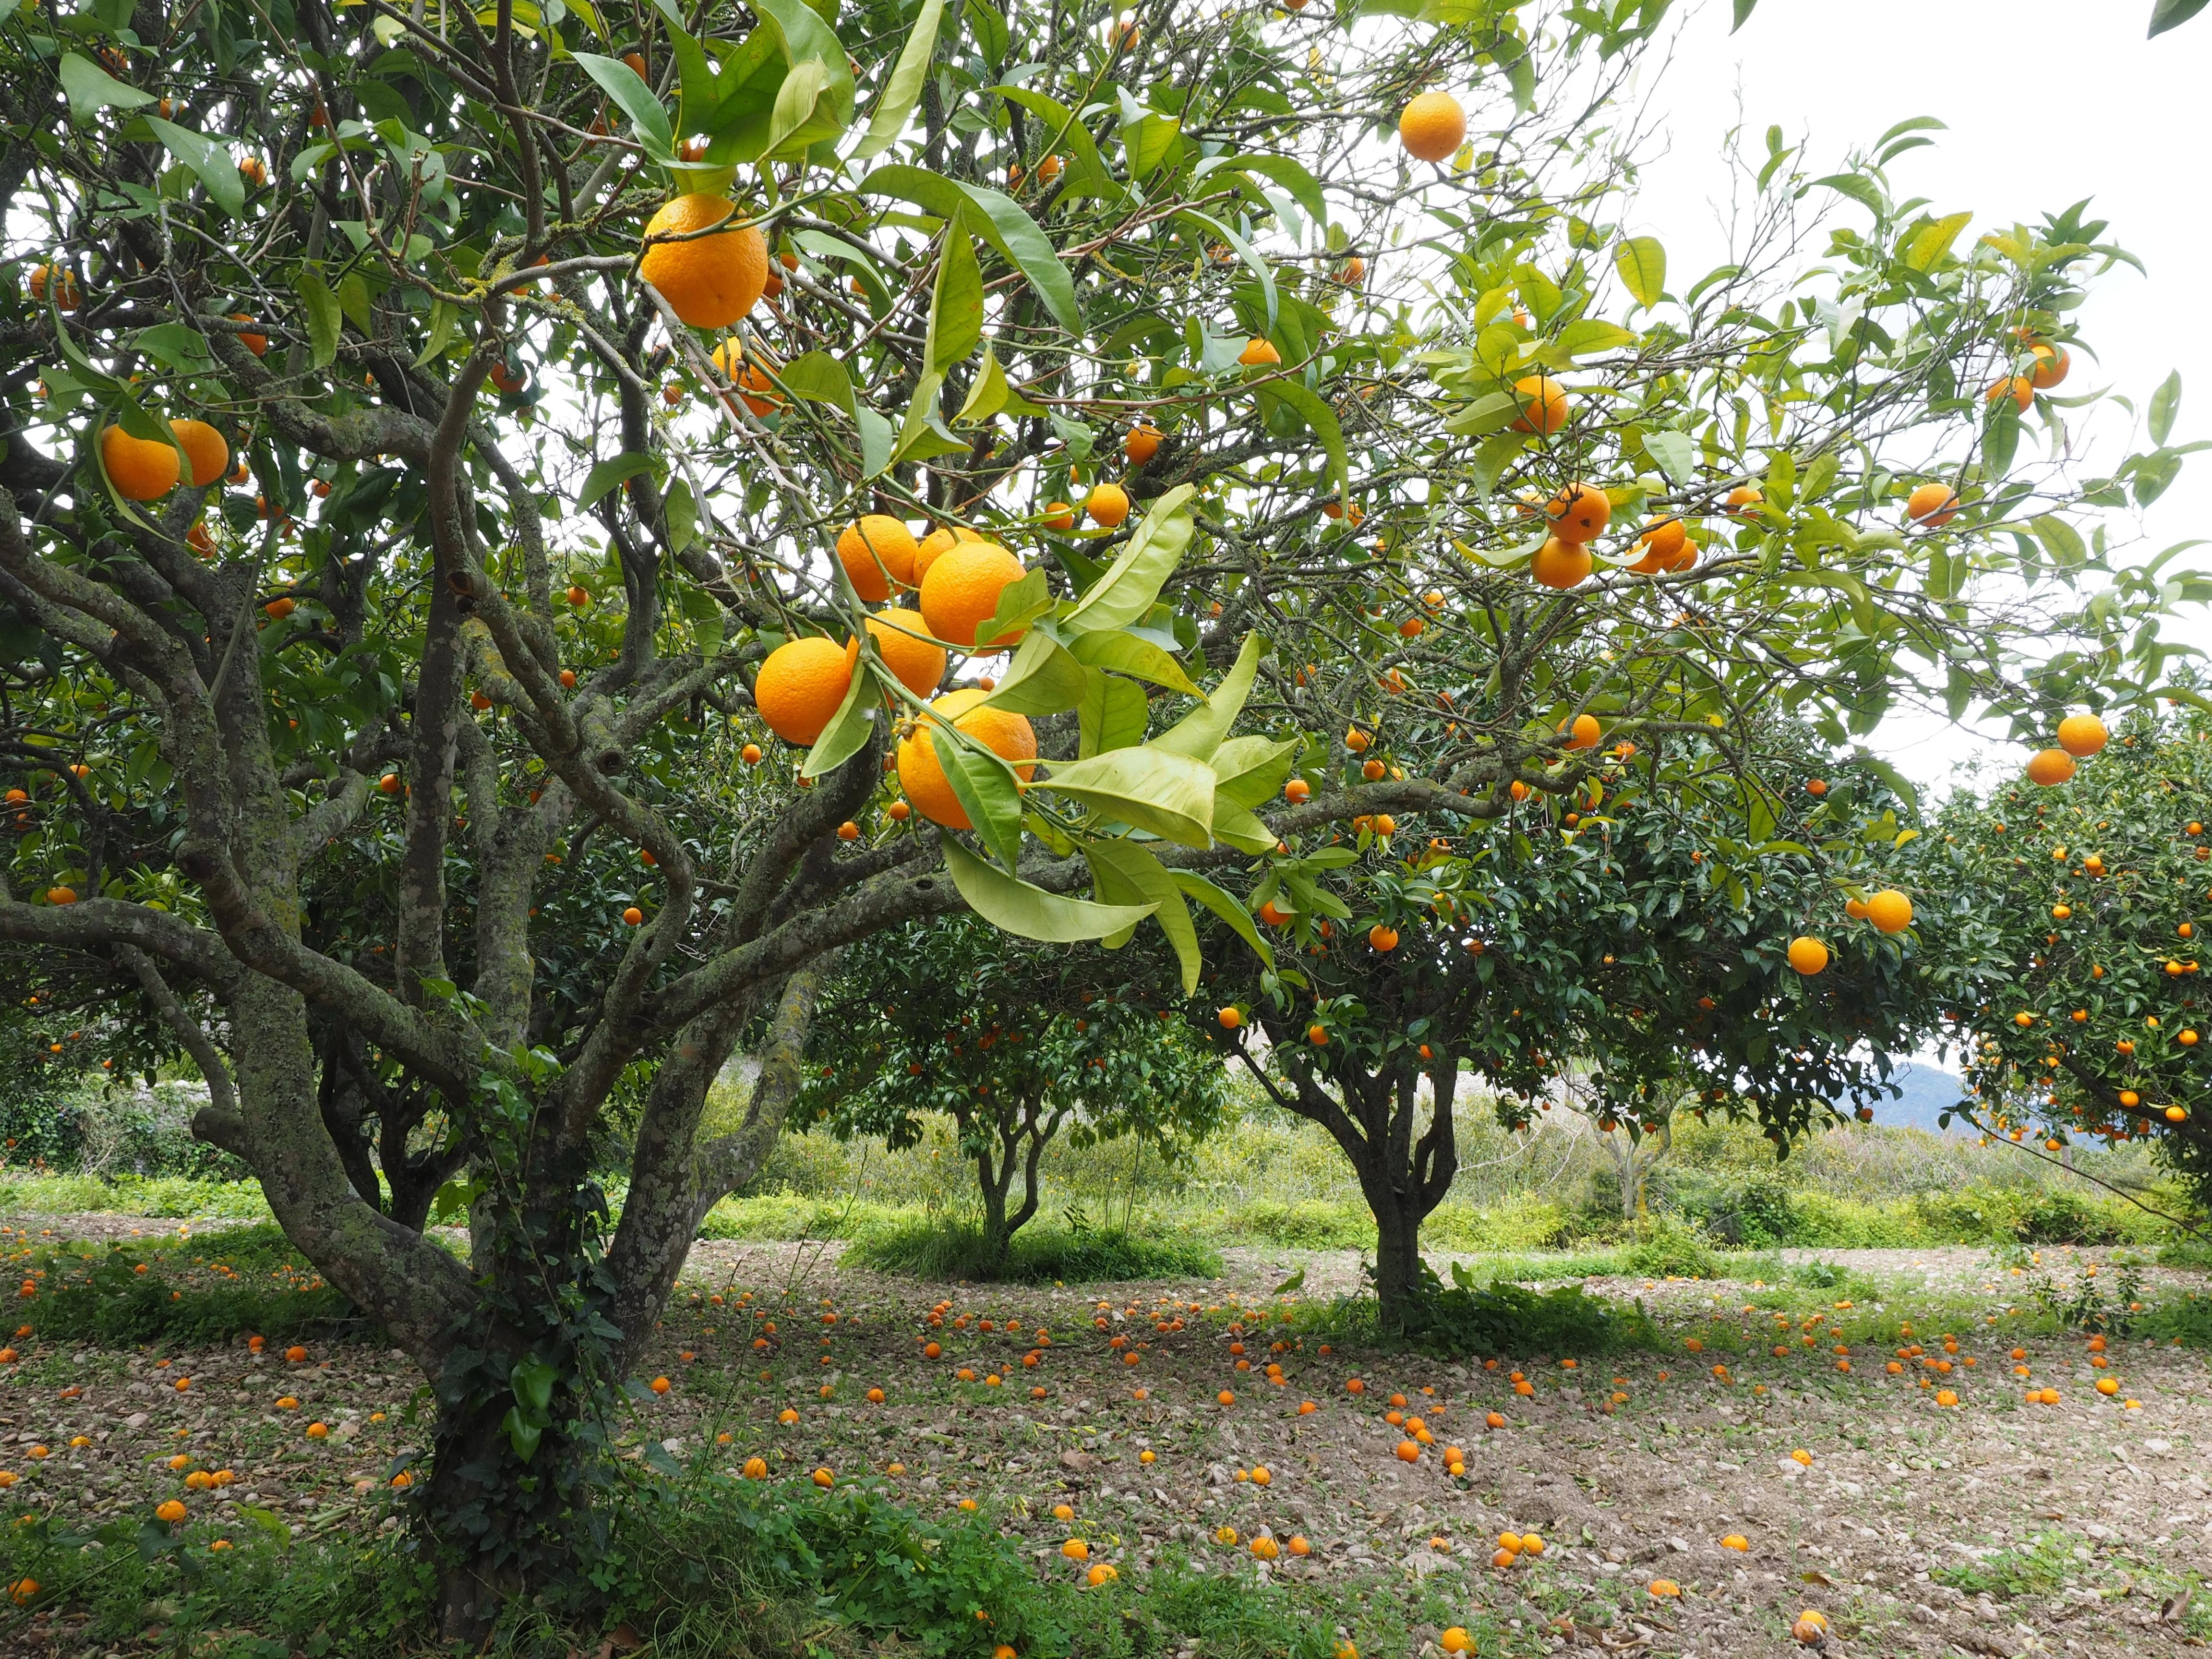 Tree Branch Plant Fruit Sweet Leaf Flower Orchard Summer Ripe Bush Orange Food Mediterranean